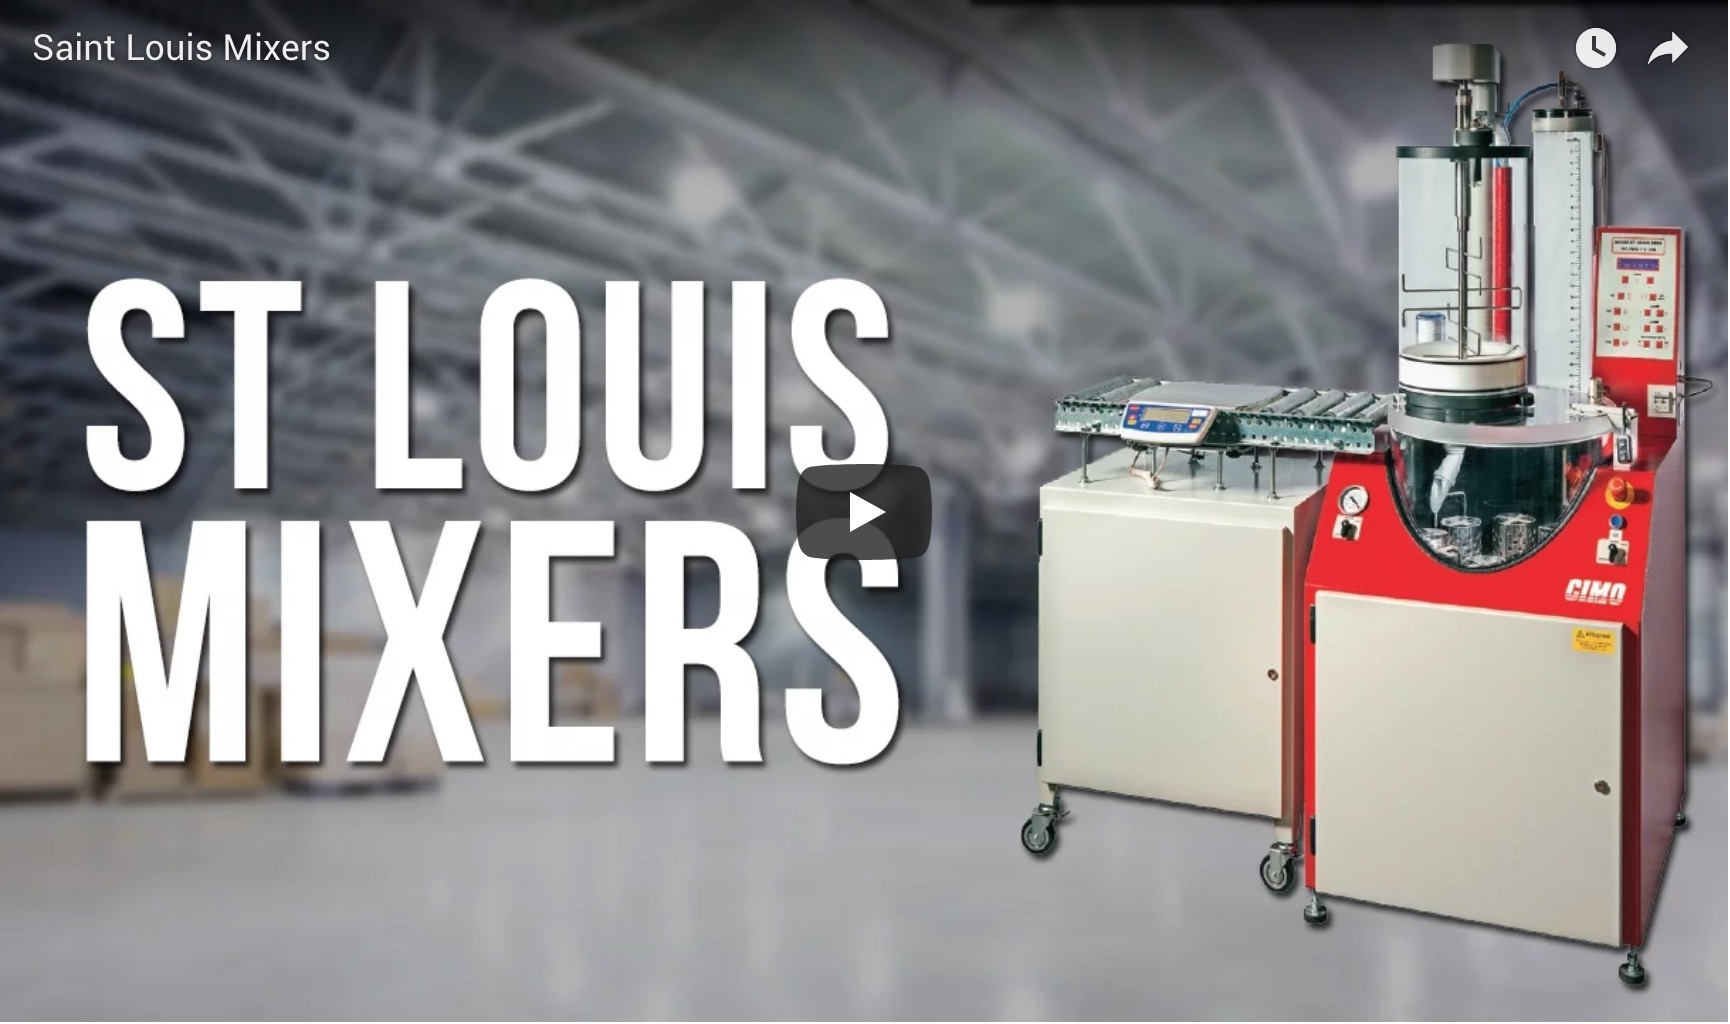 Saint Louis Mixers